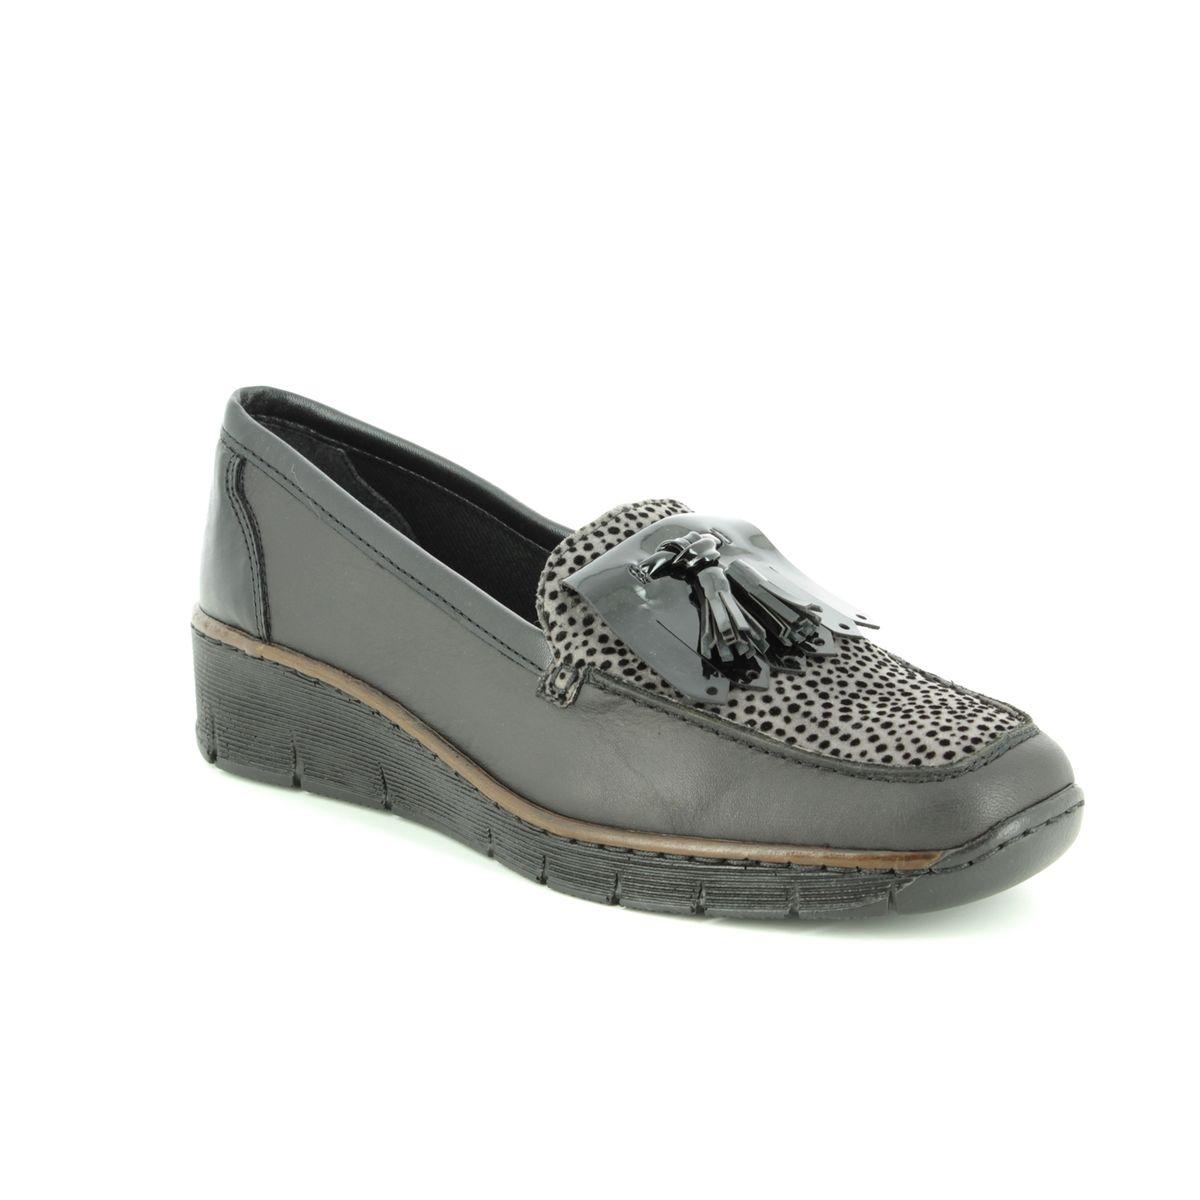 9b39315a02a Rieker Comfort Shoes - Black multi - 537B6-00 BOCCITAS